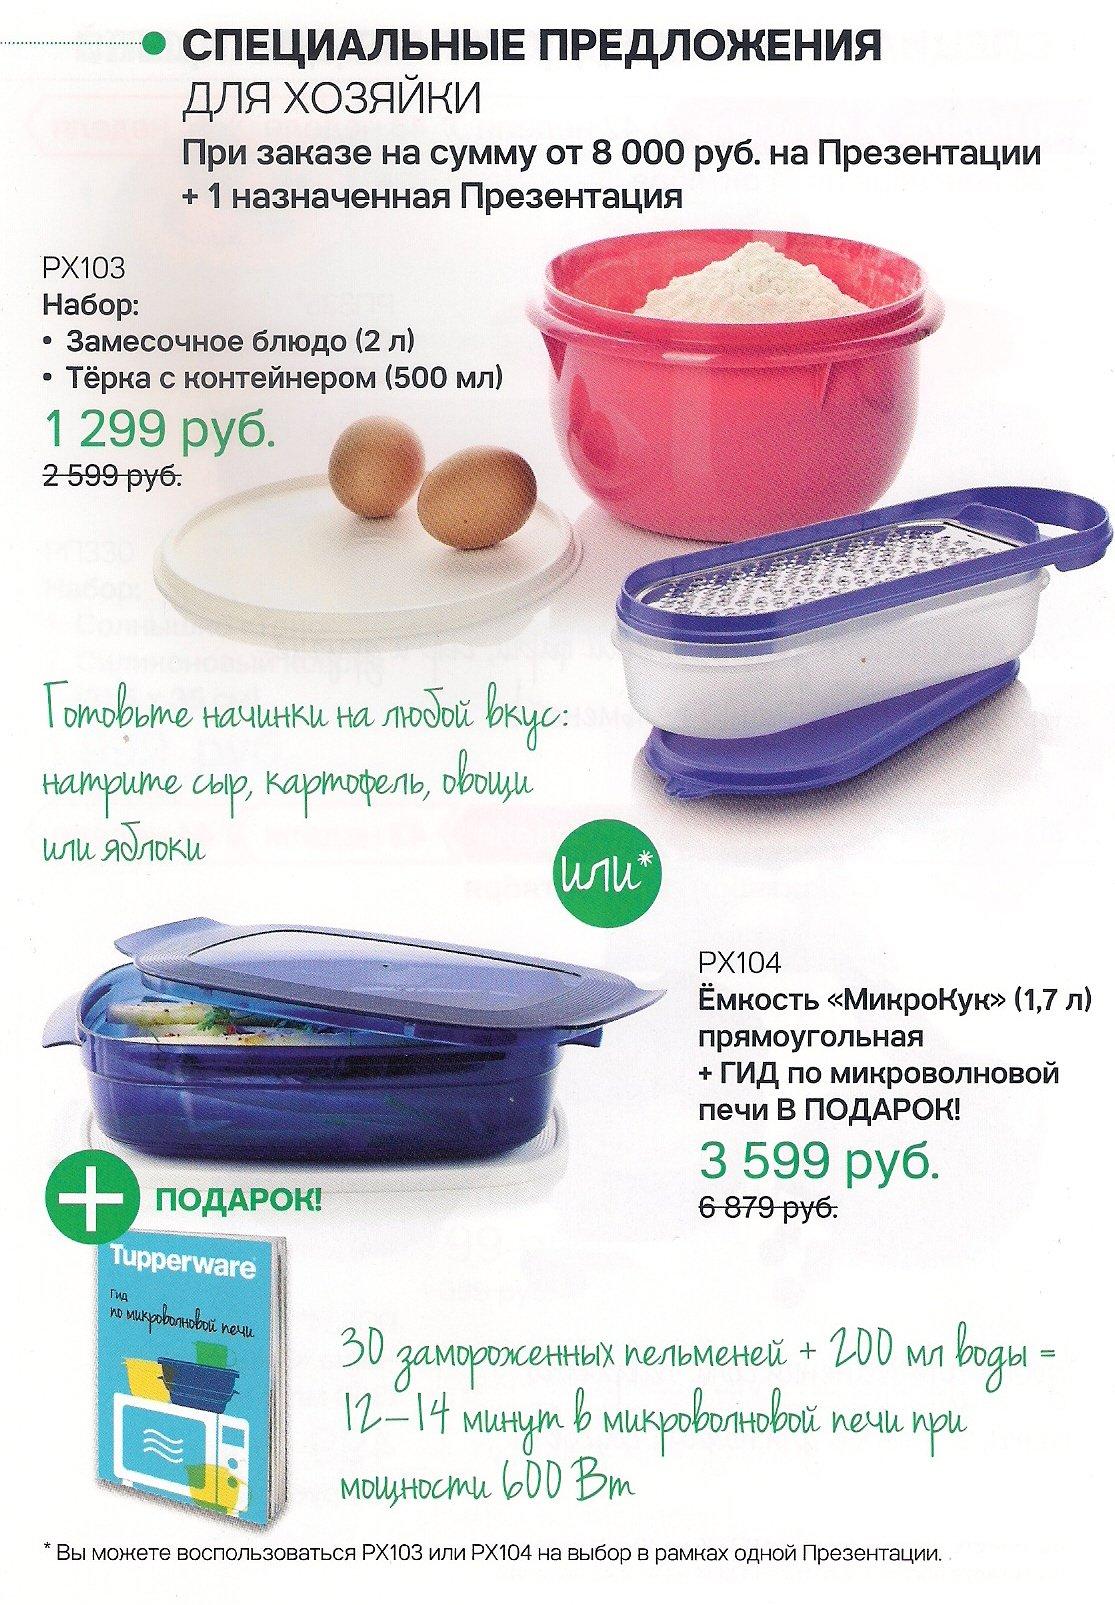 http://tupperware-online.ru/images/upload/15d.jpg